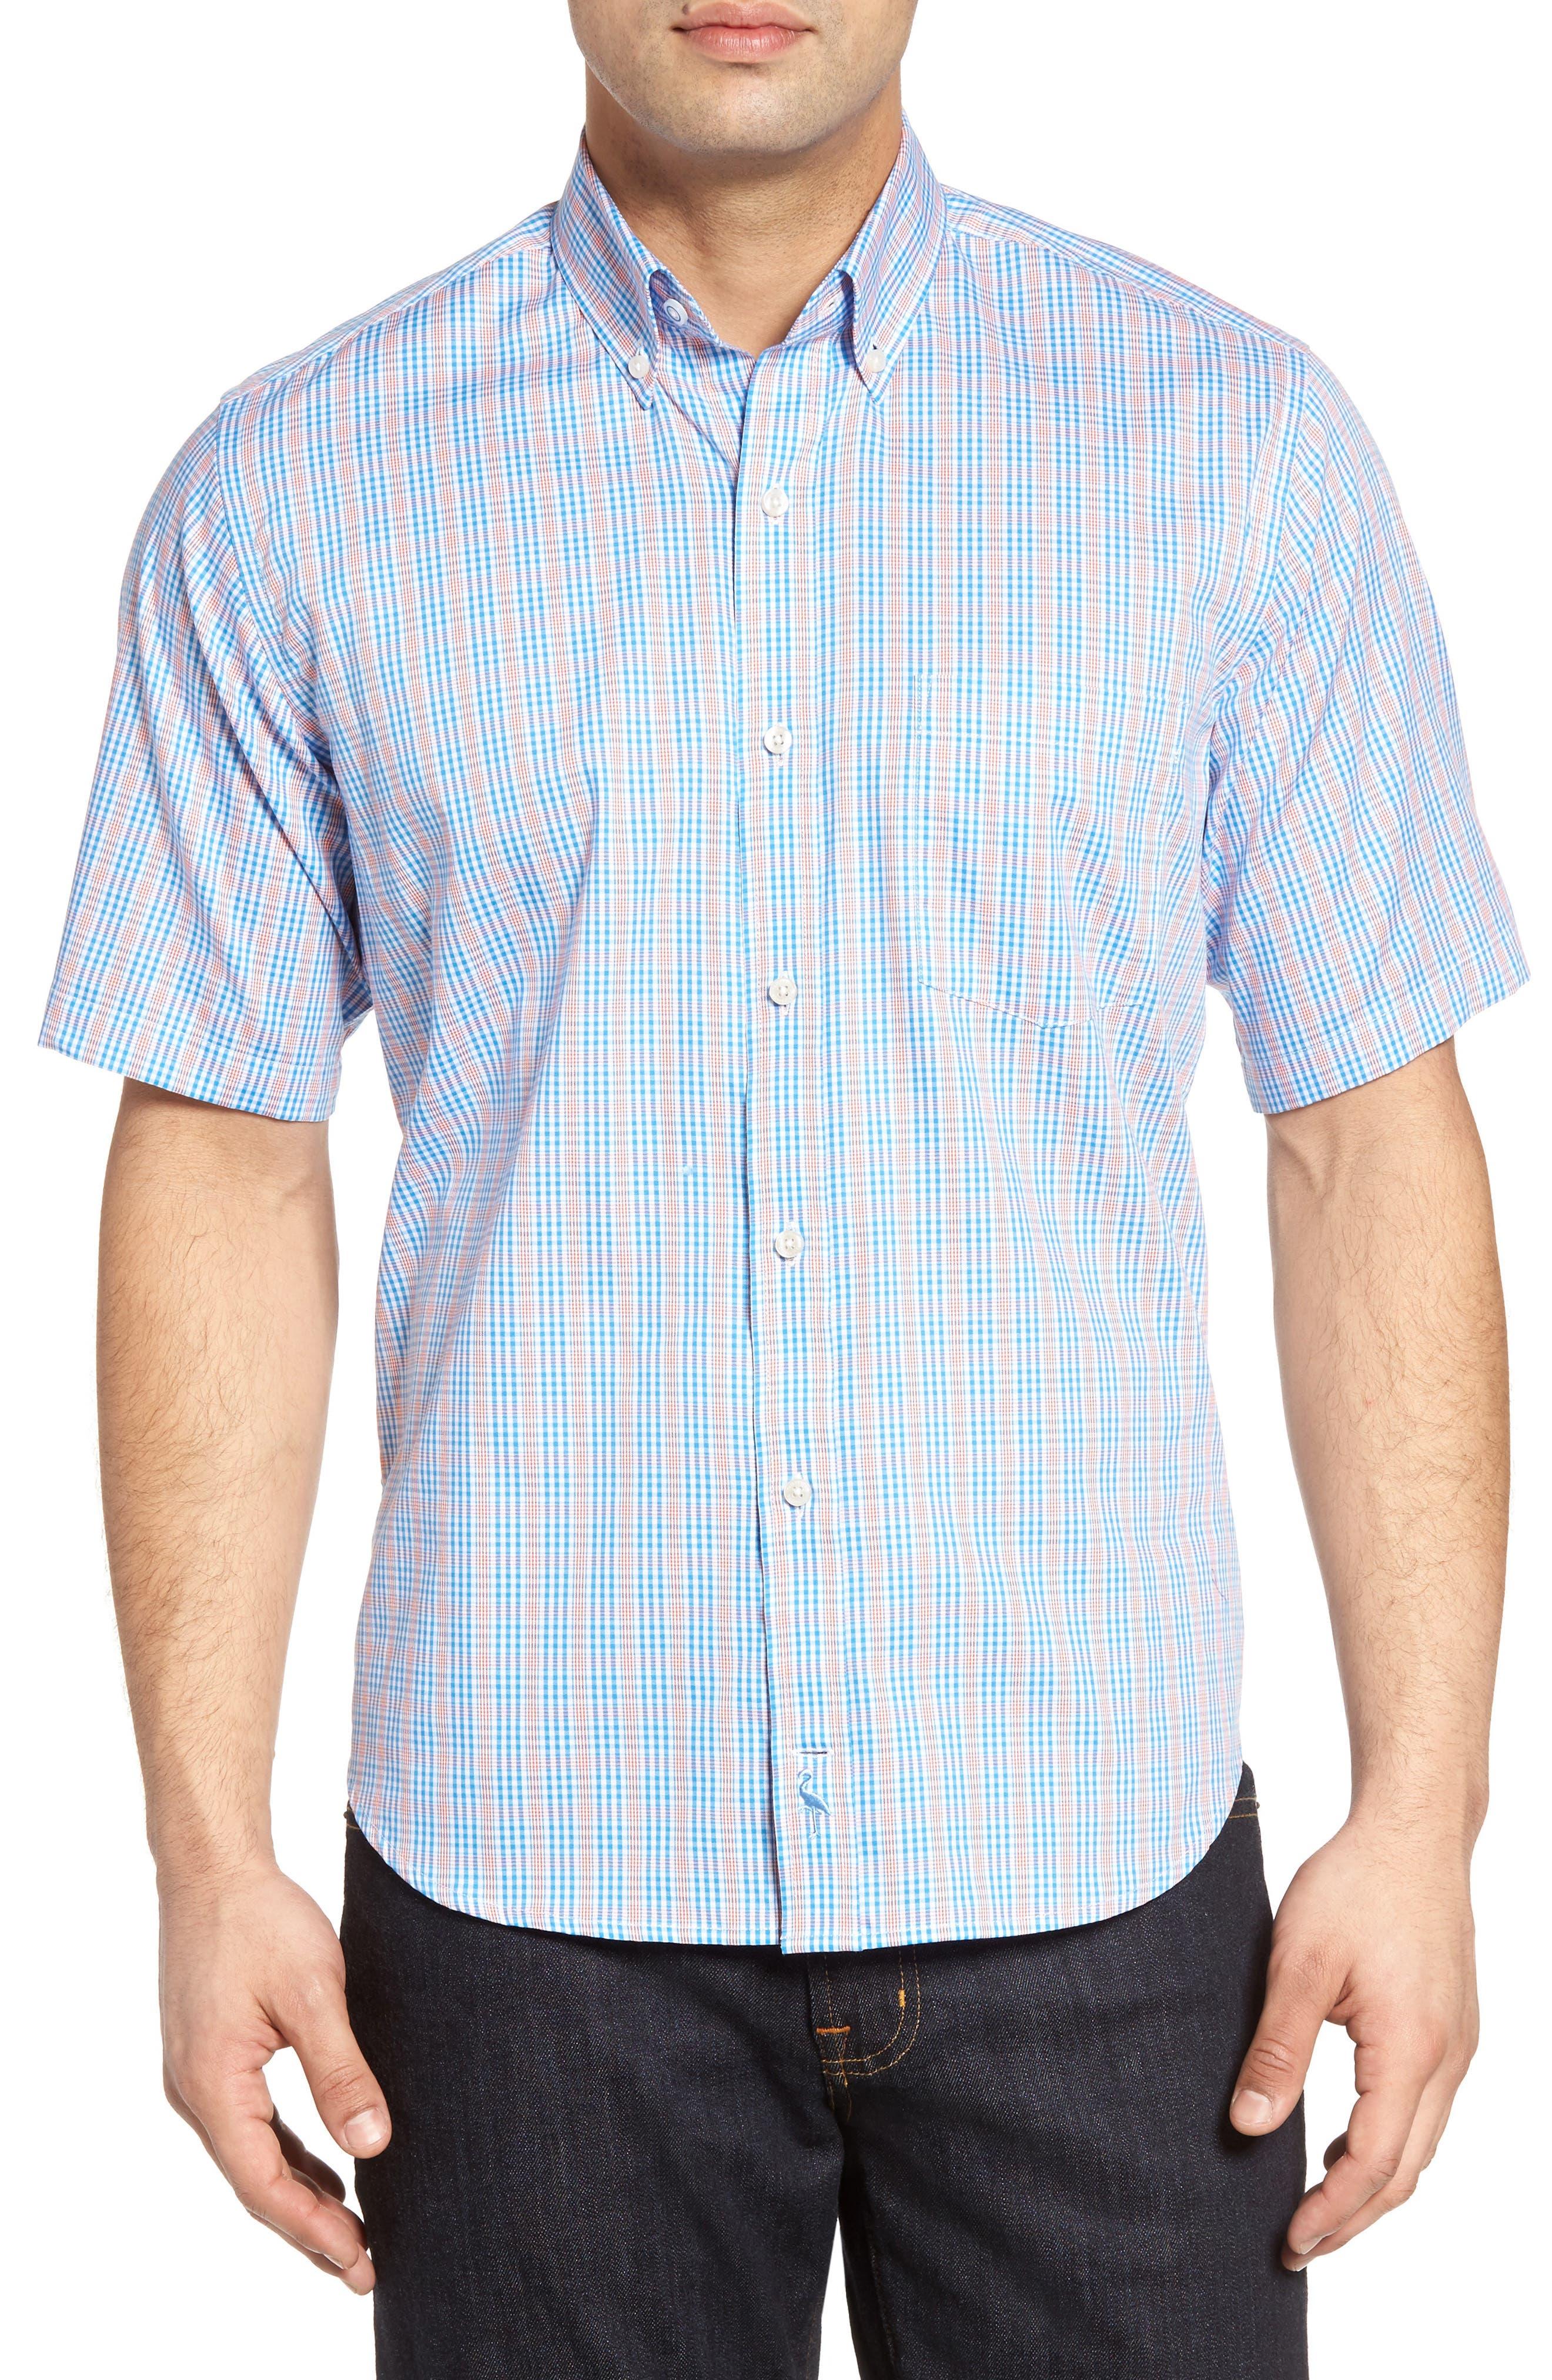 TailorByrd Karoo Plaid Sport Shirt (Big & Tall)